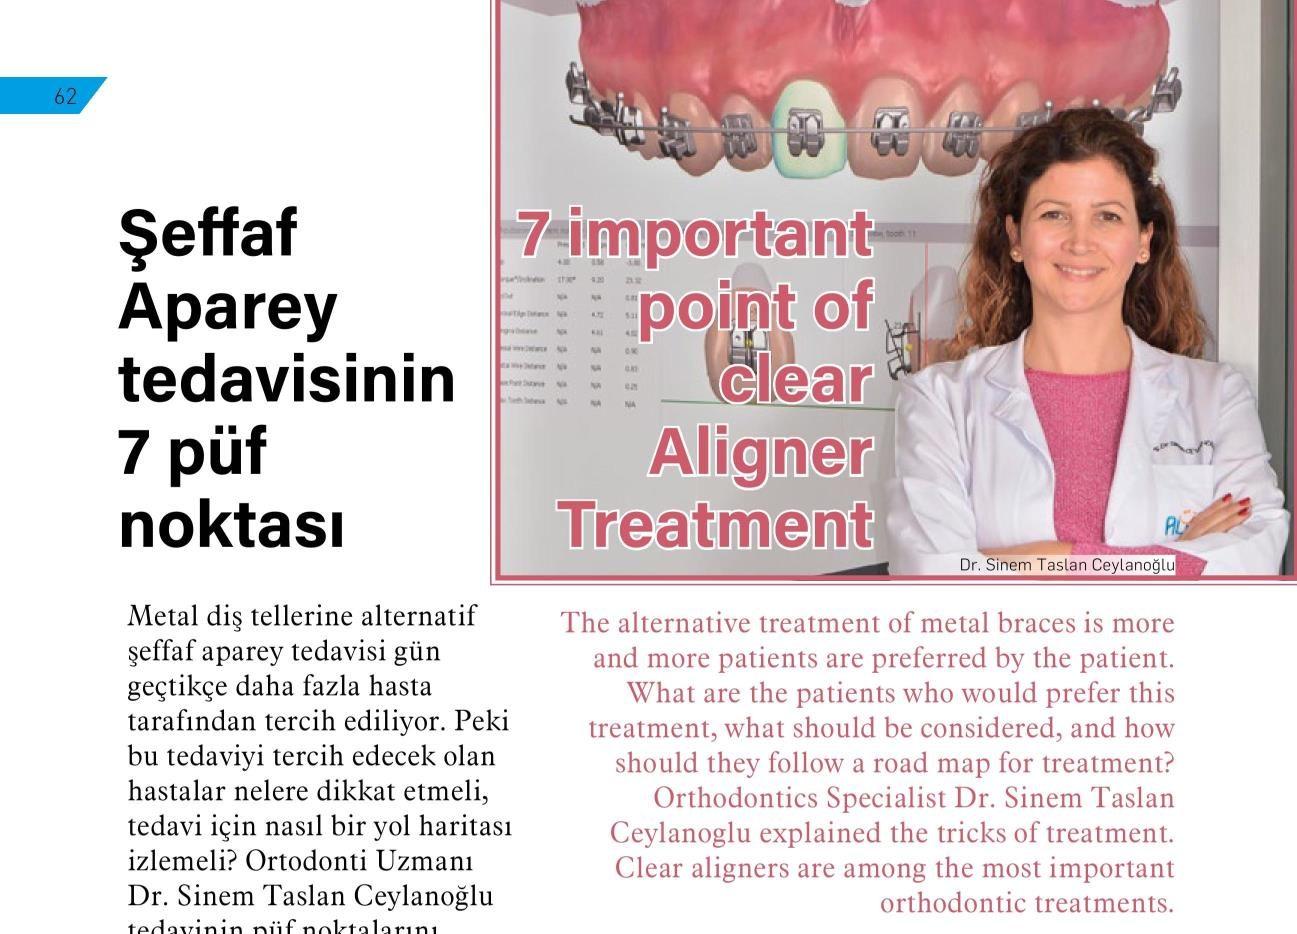 MEDİKAL+&+TEKNİK_20181201_62